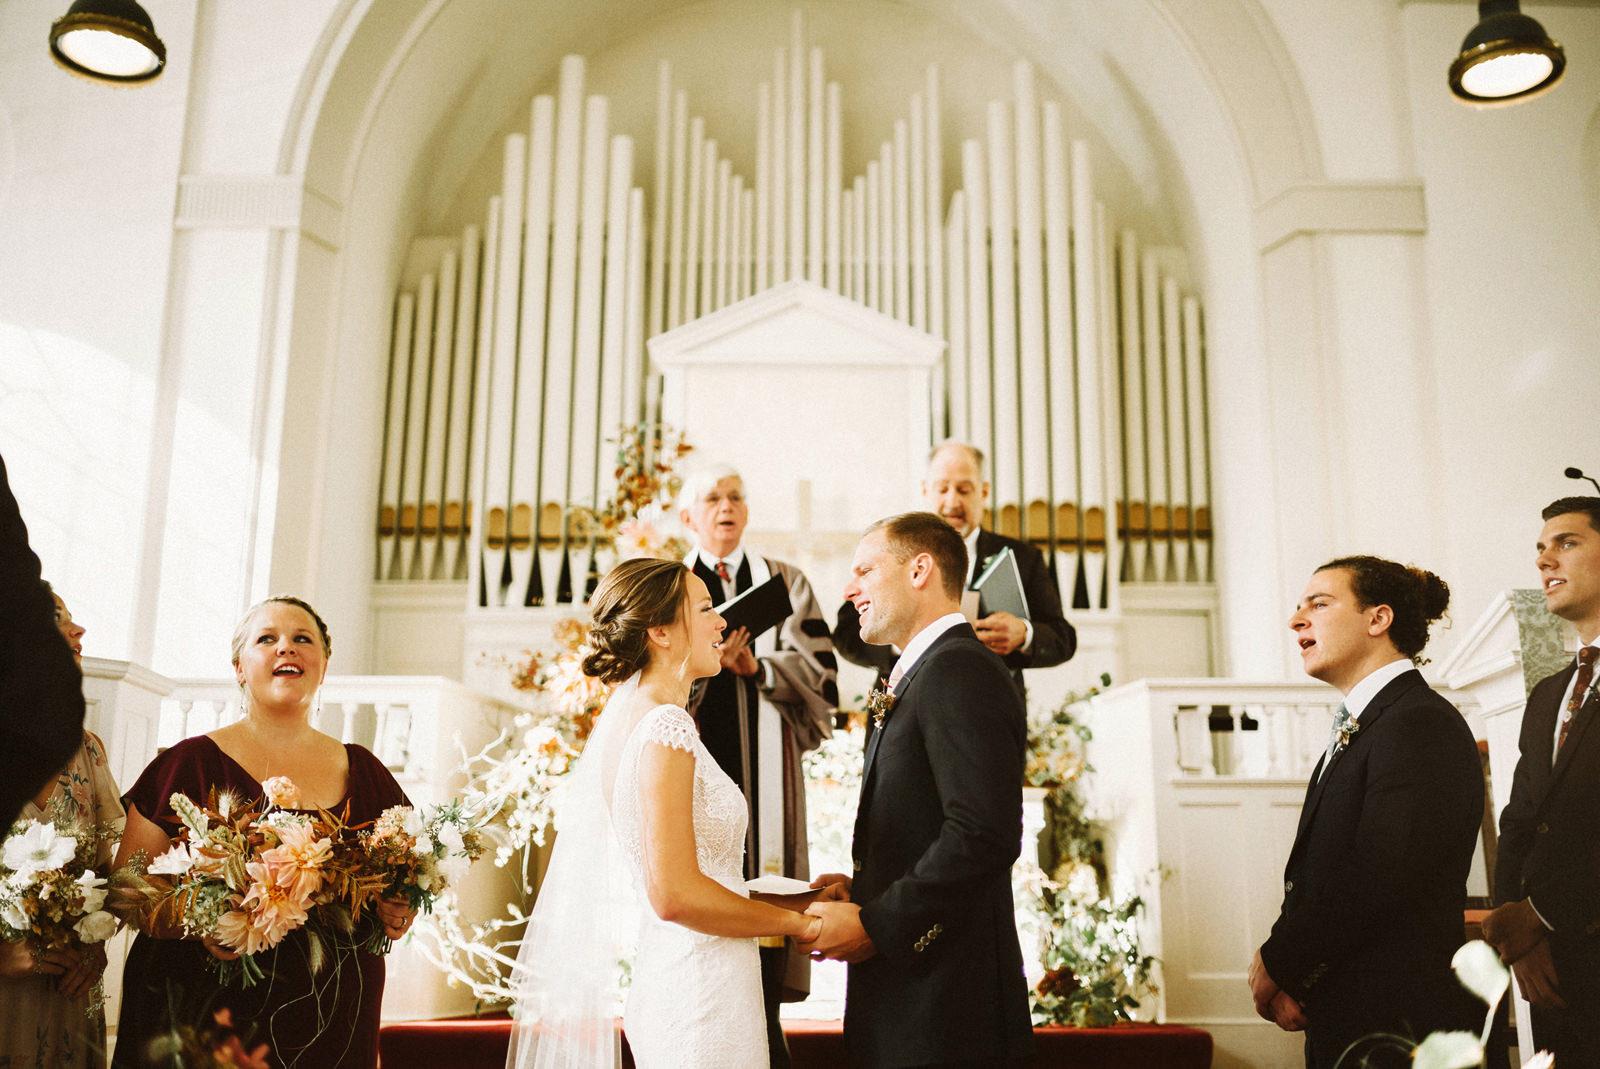 bridgeport-wedding-060 BRIDGEPORT, CONNECTICUT BACKYARD WEDDING